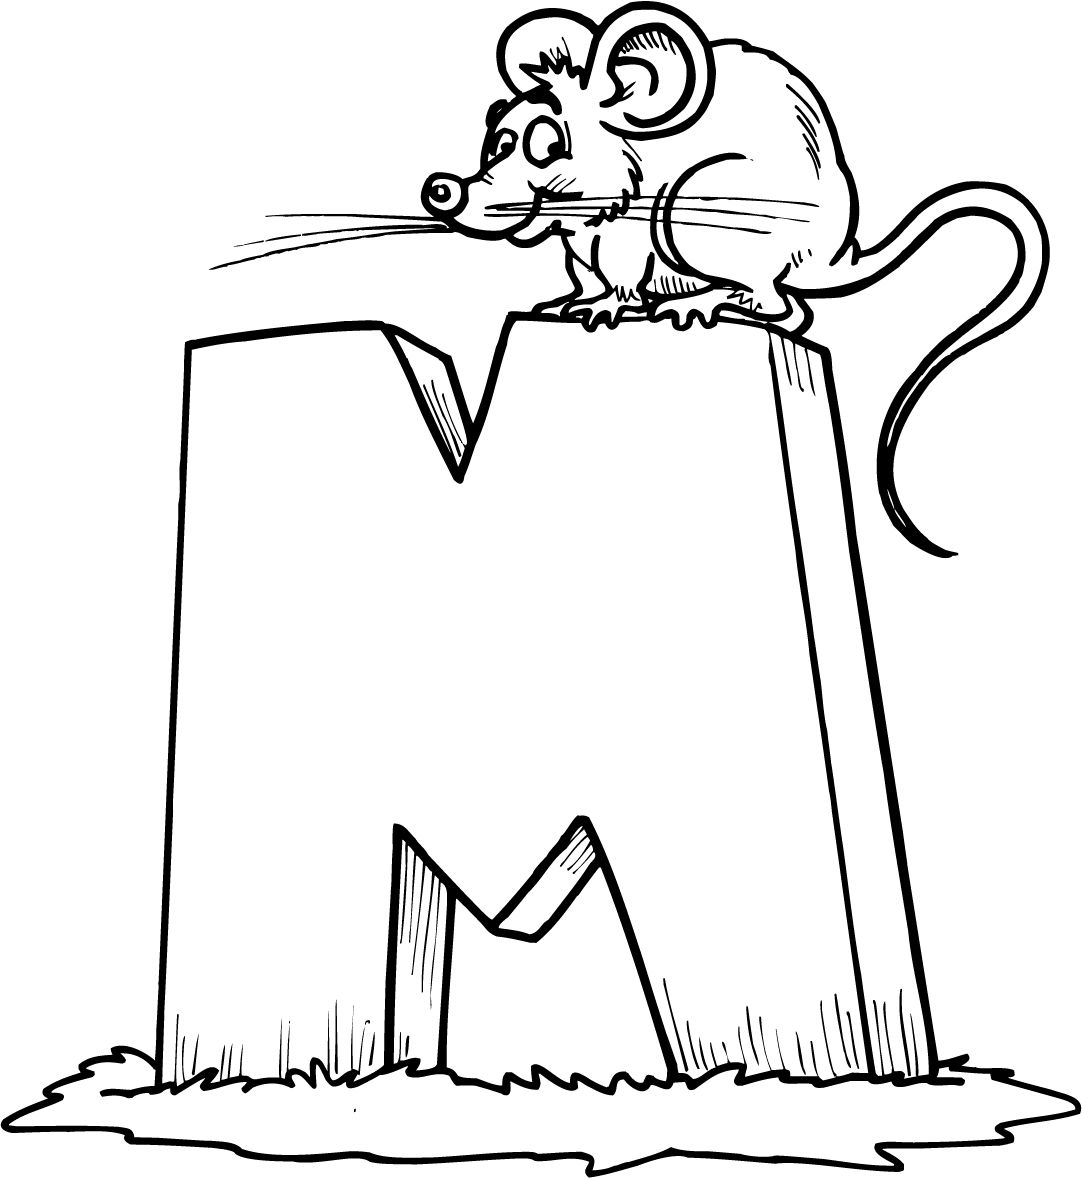 Coloring Sheet Of A Letter M Alfabet Kleurplaten Thema [ 1178 x 1082 Pixel ]